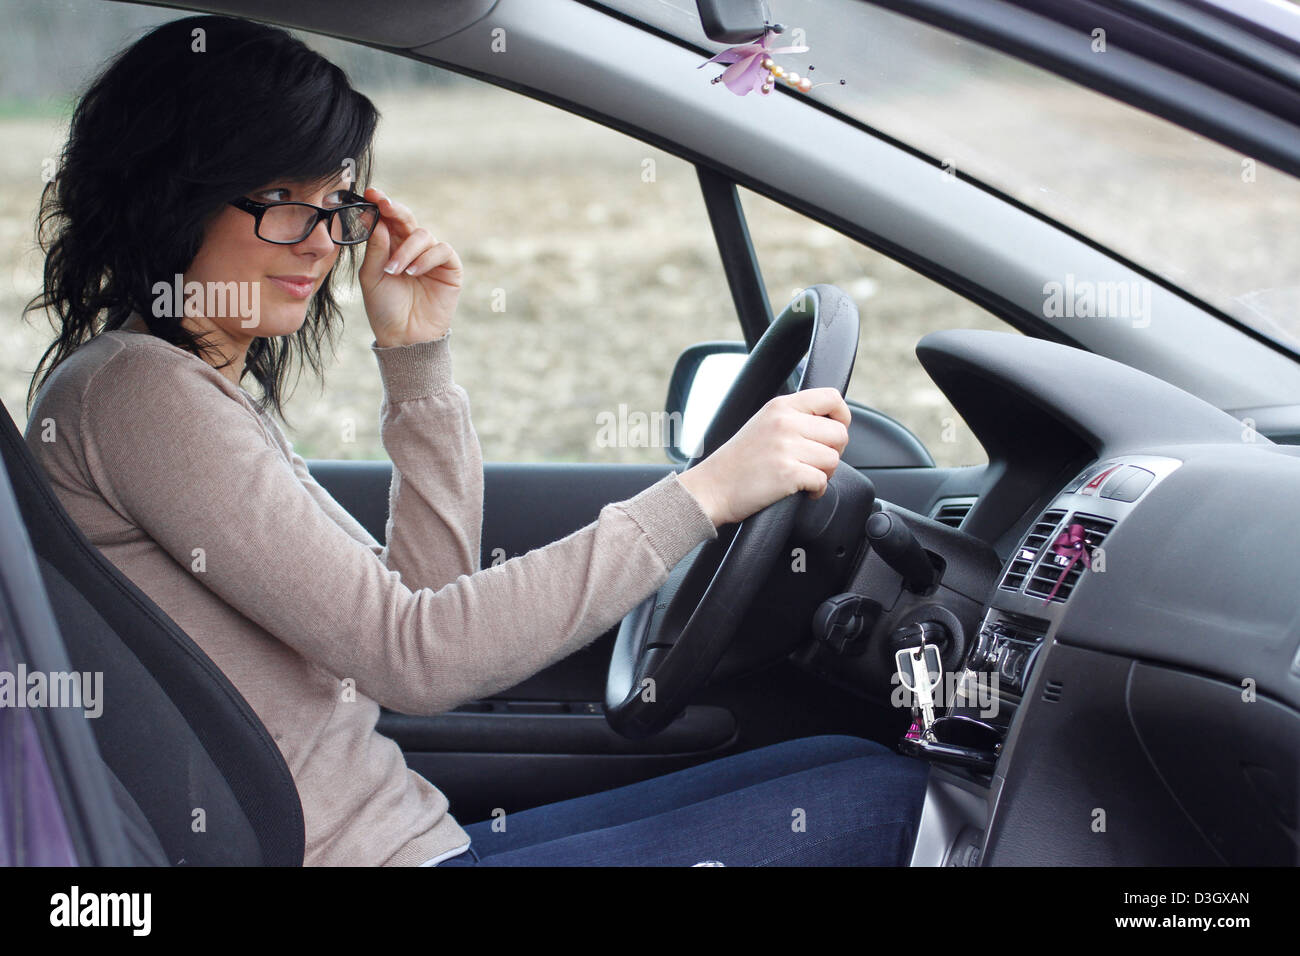 Pilote automobile Photo Stock